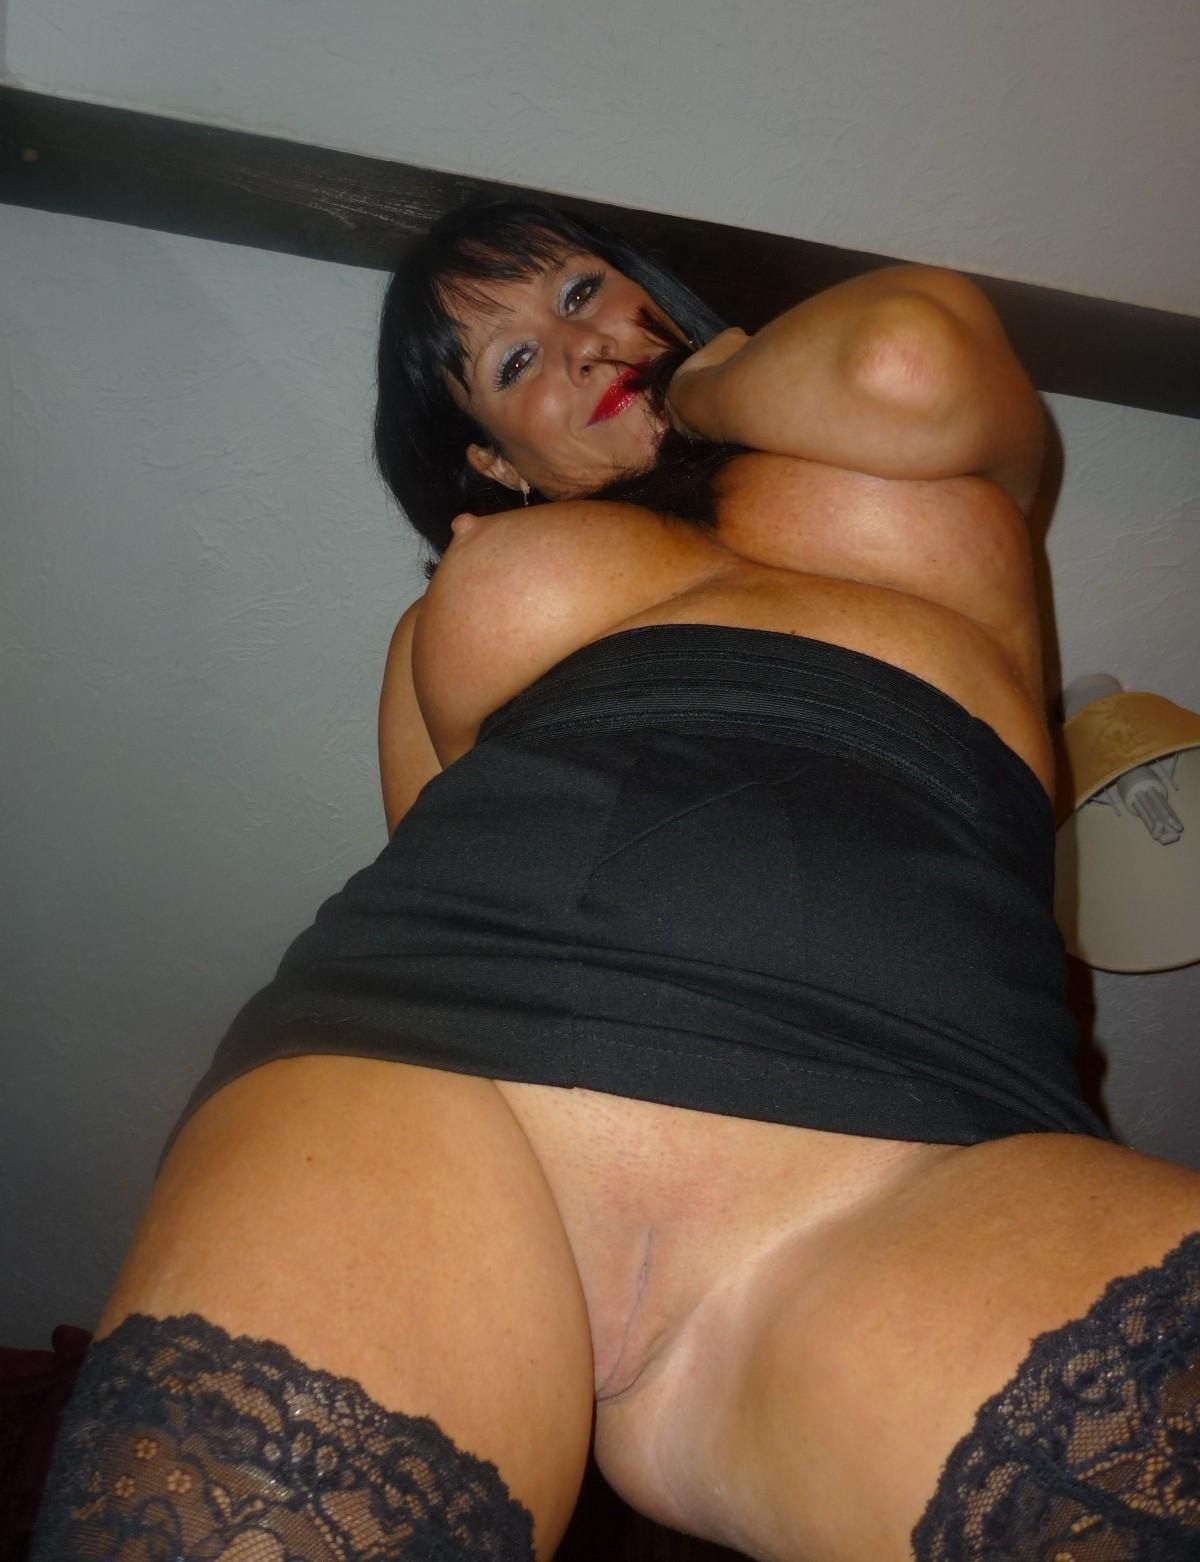 Very hot cougar mom nude